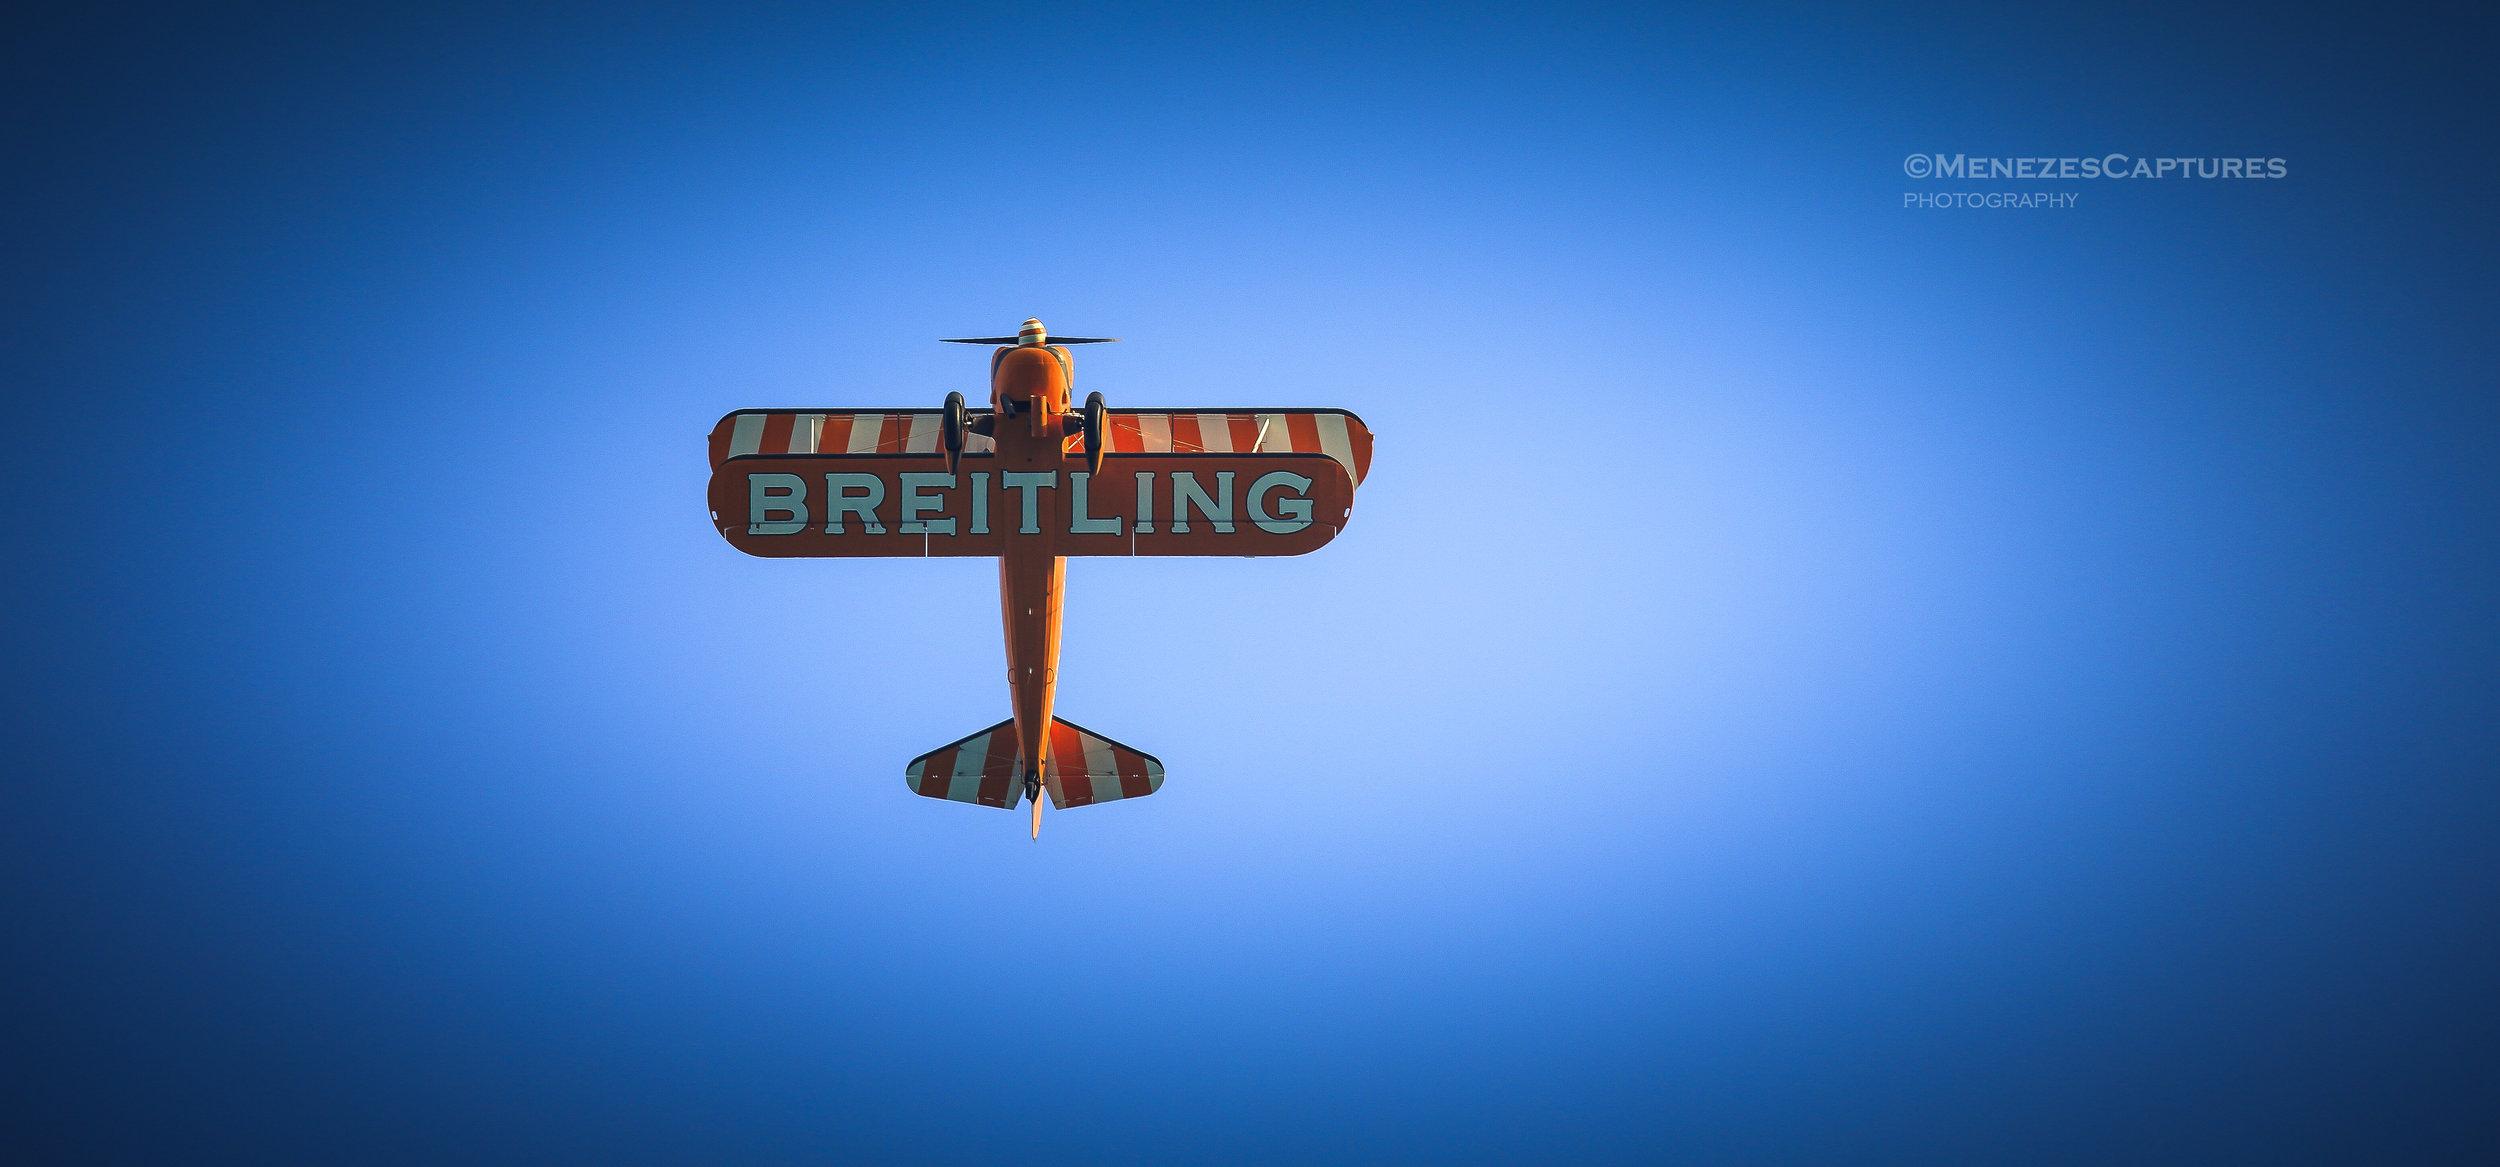 Brietling-37 copy.jpg